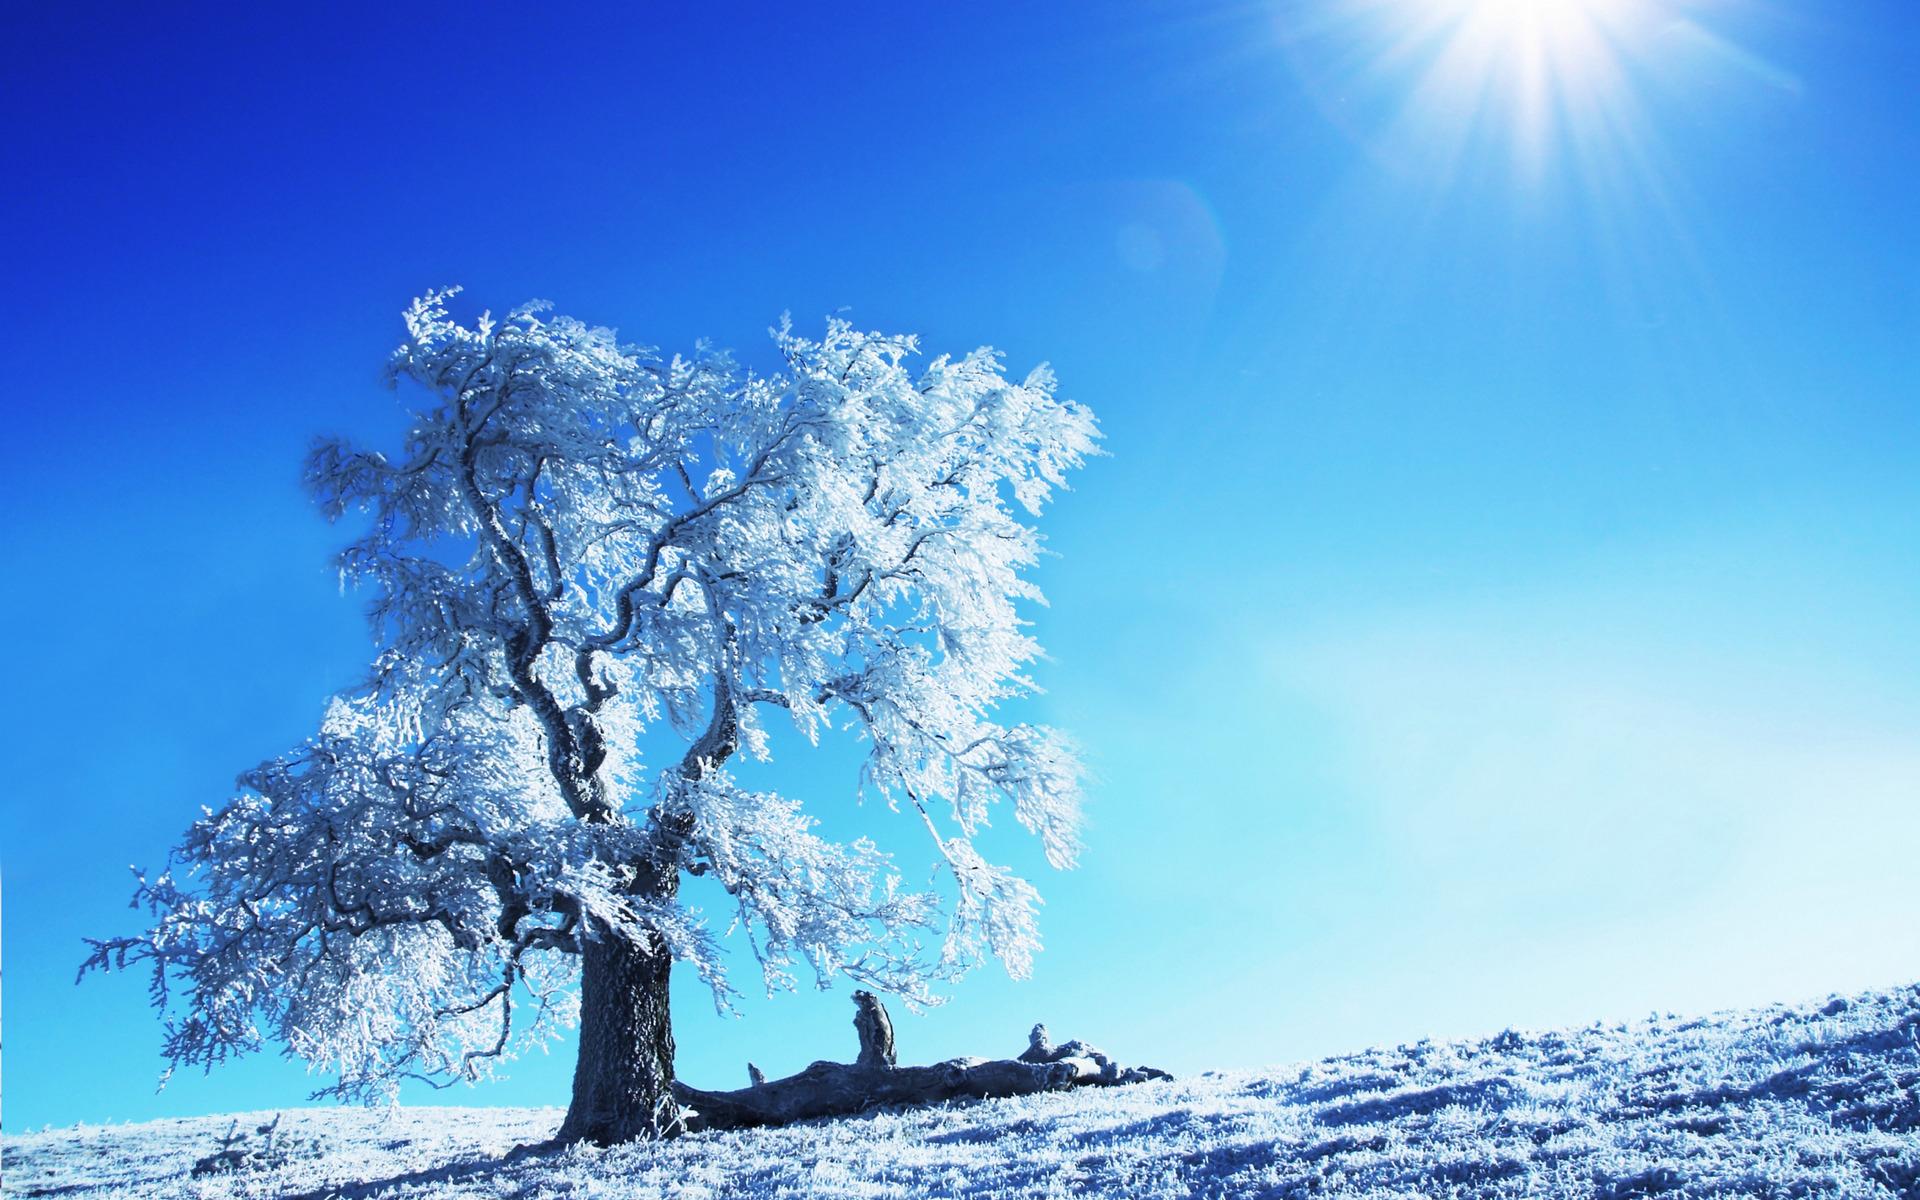 Winter winter wallpaper view snow blizzard trees nature tree